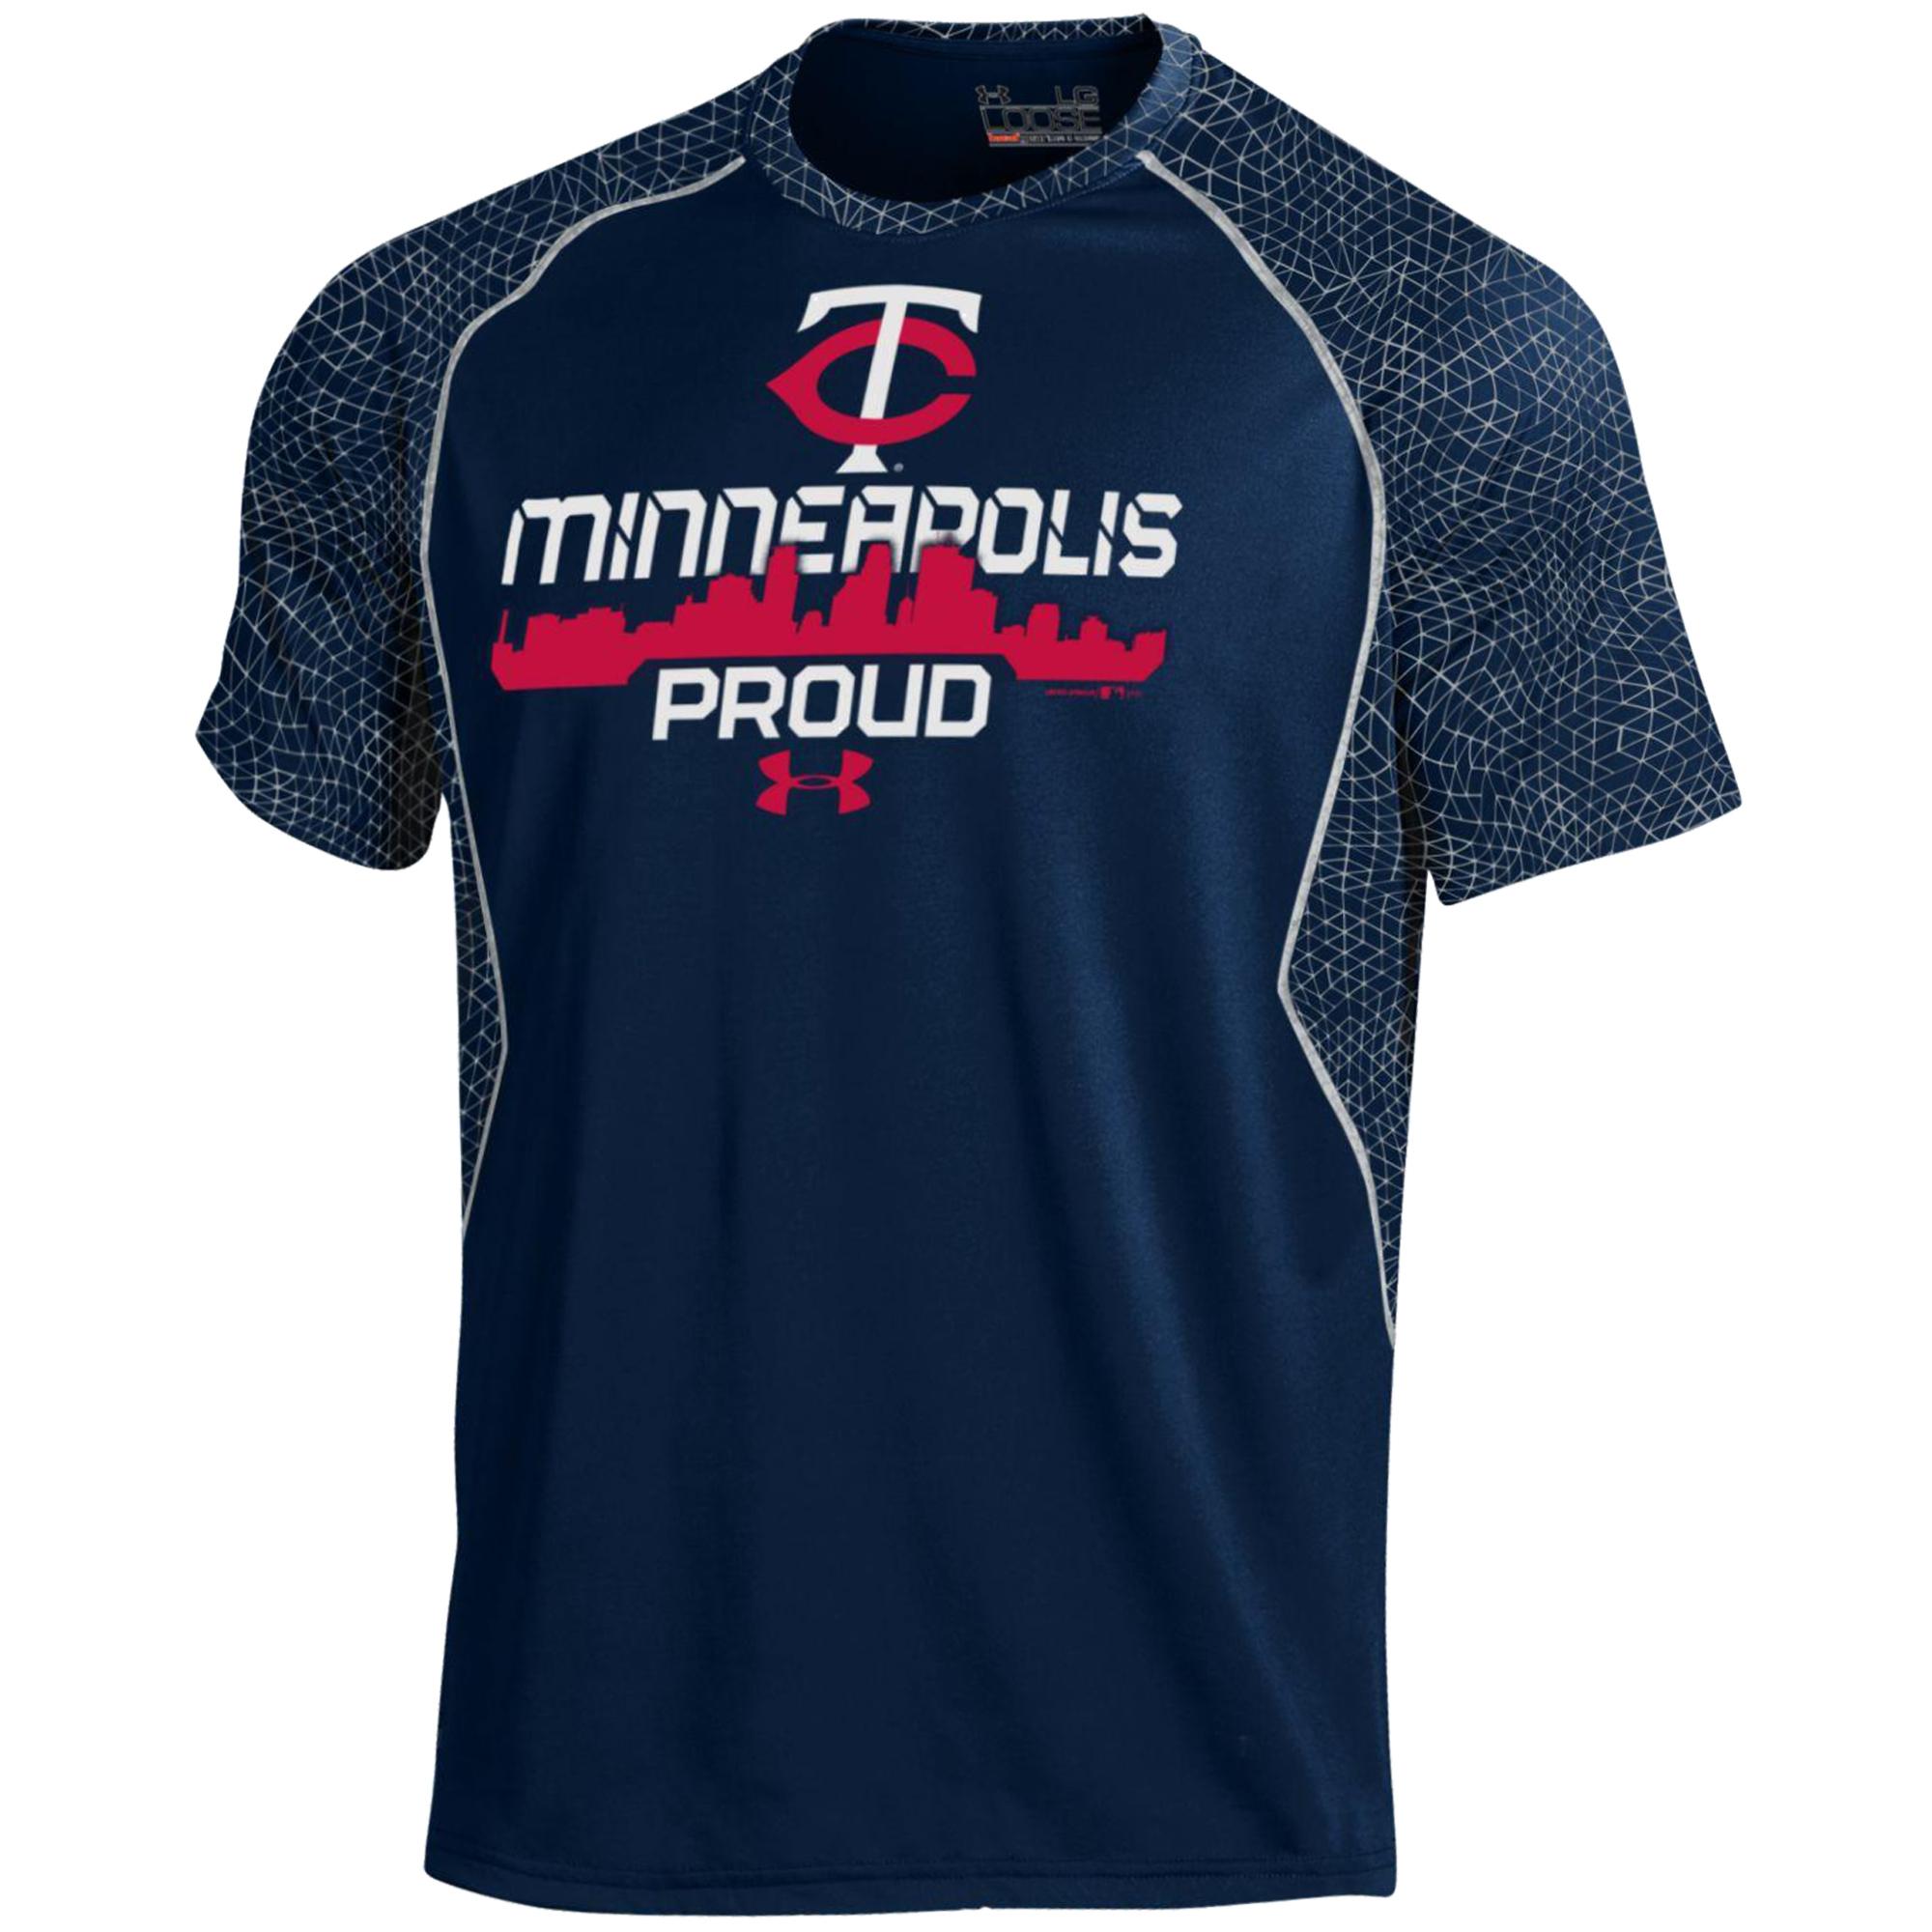 Minnesota Twins Under Armour Apex Print Performance T-Shirt - Navy